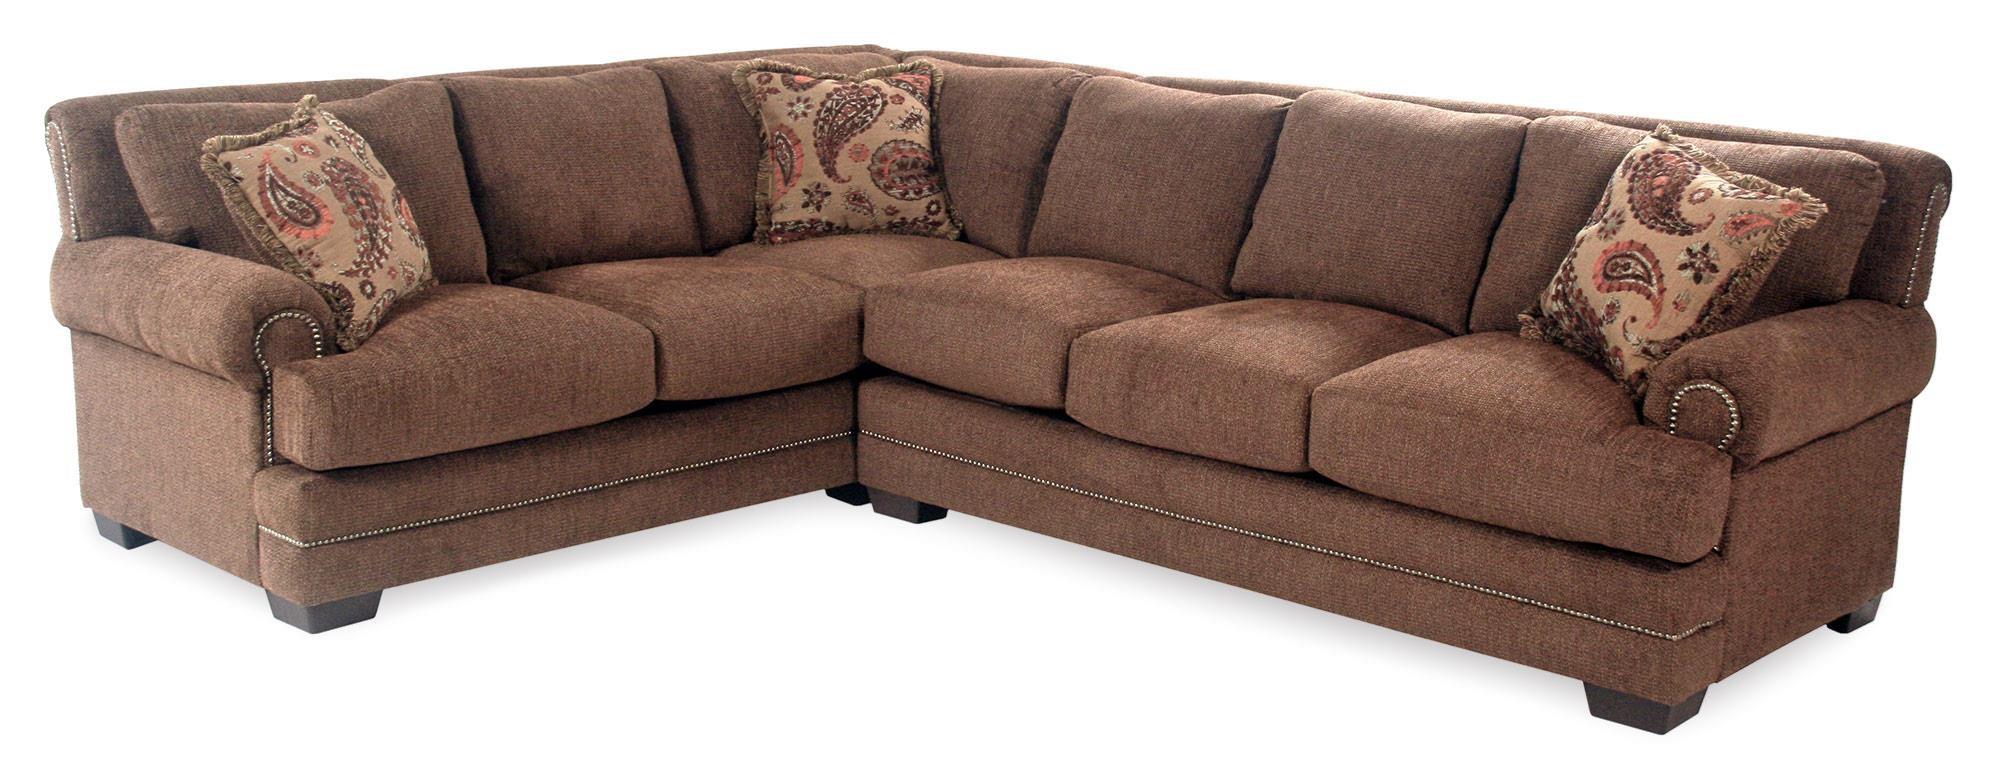 Serta Upholstery Sunderland 2PC Sectional w/ Nailhead Trim - Item Number: 9800-LFSCT+RFS